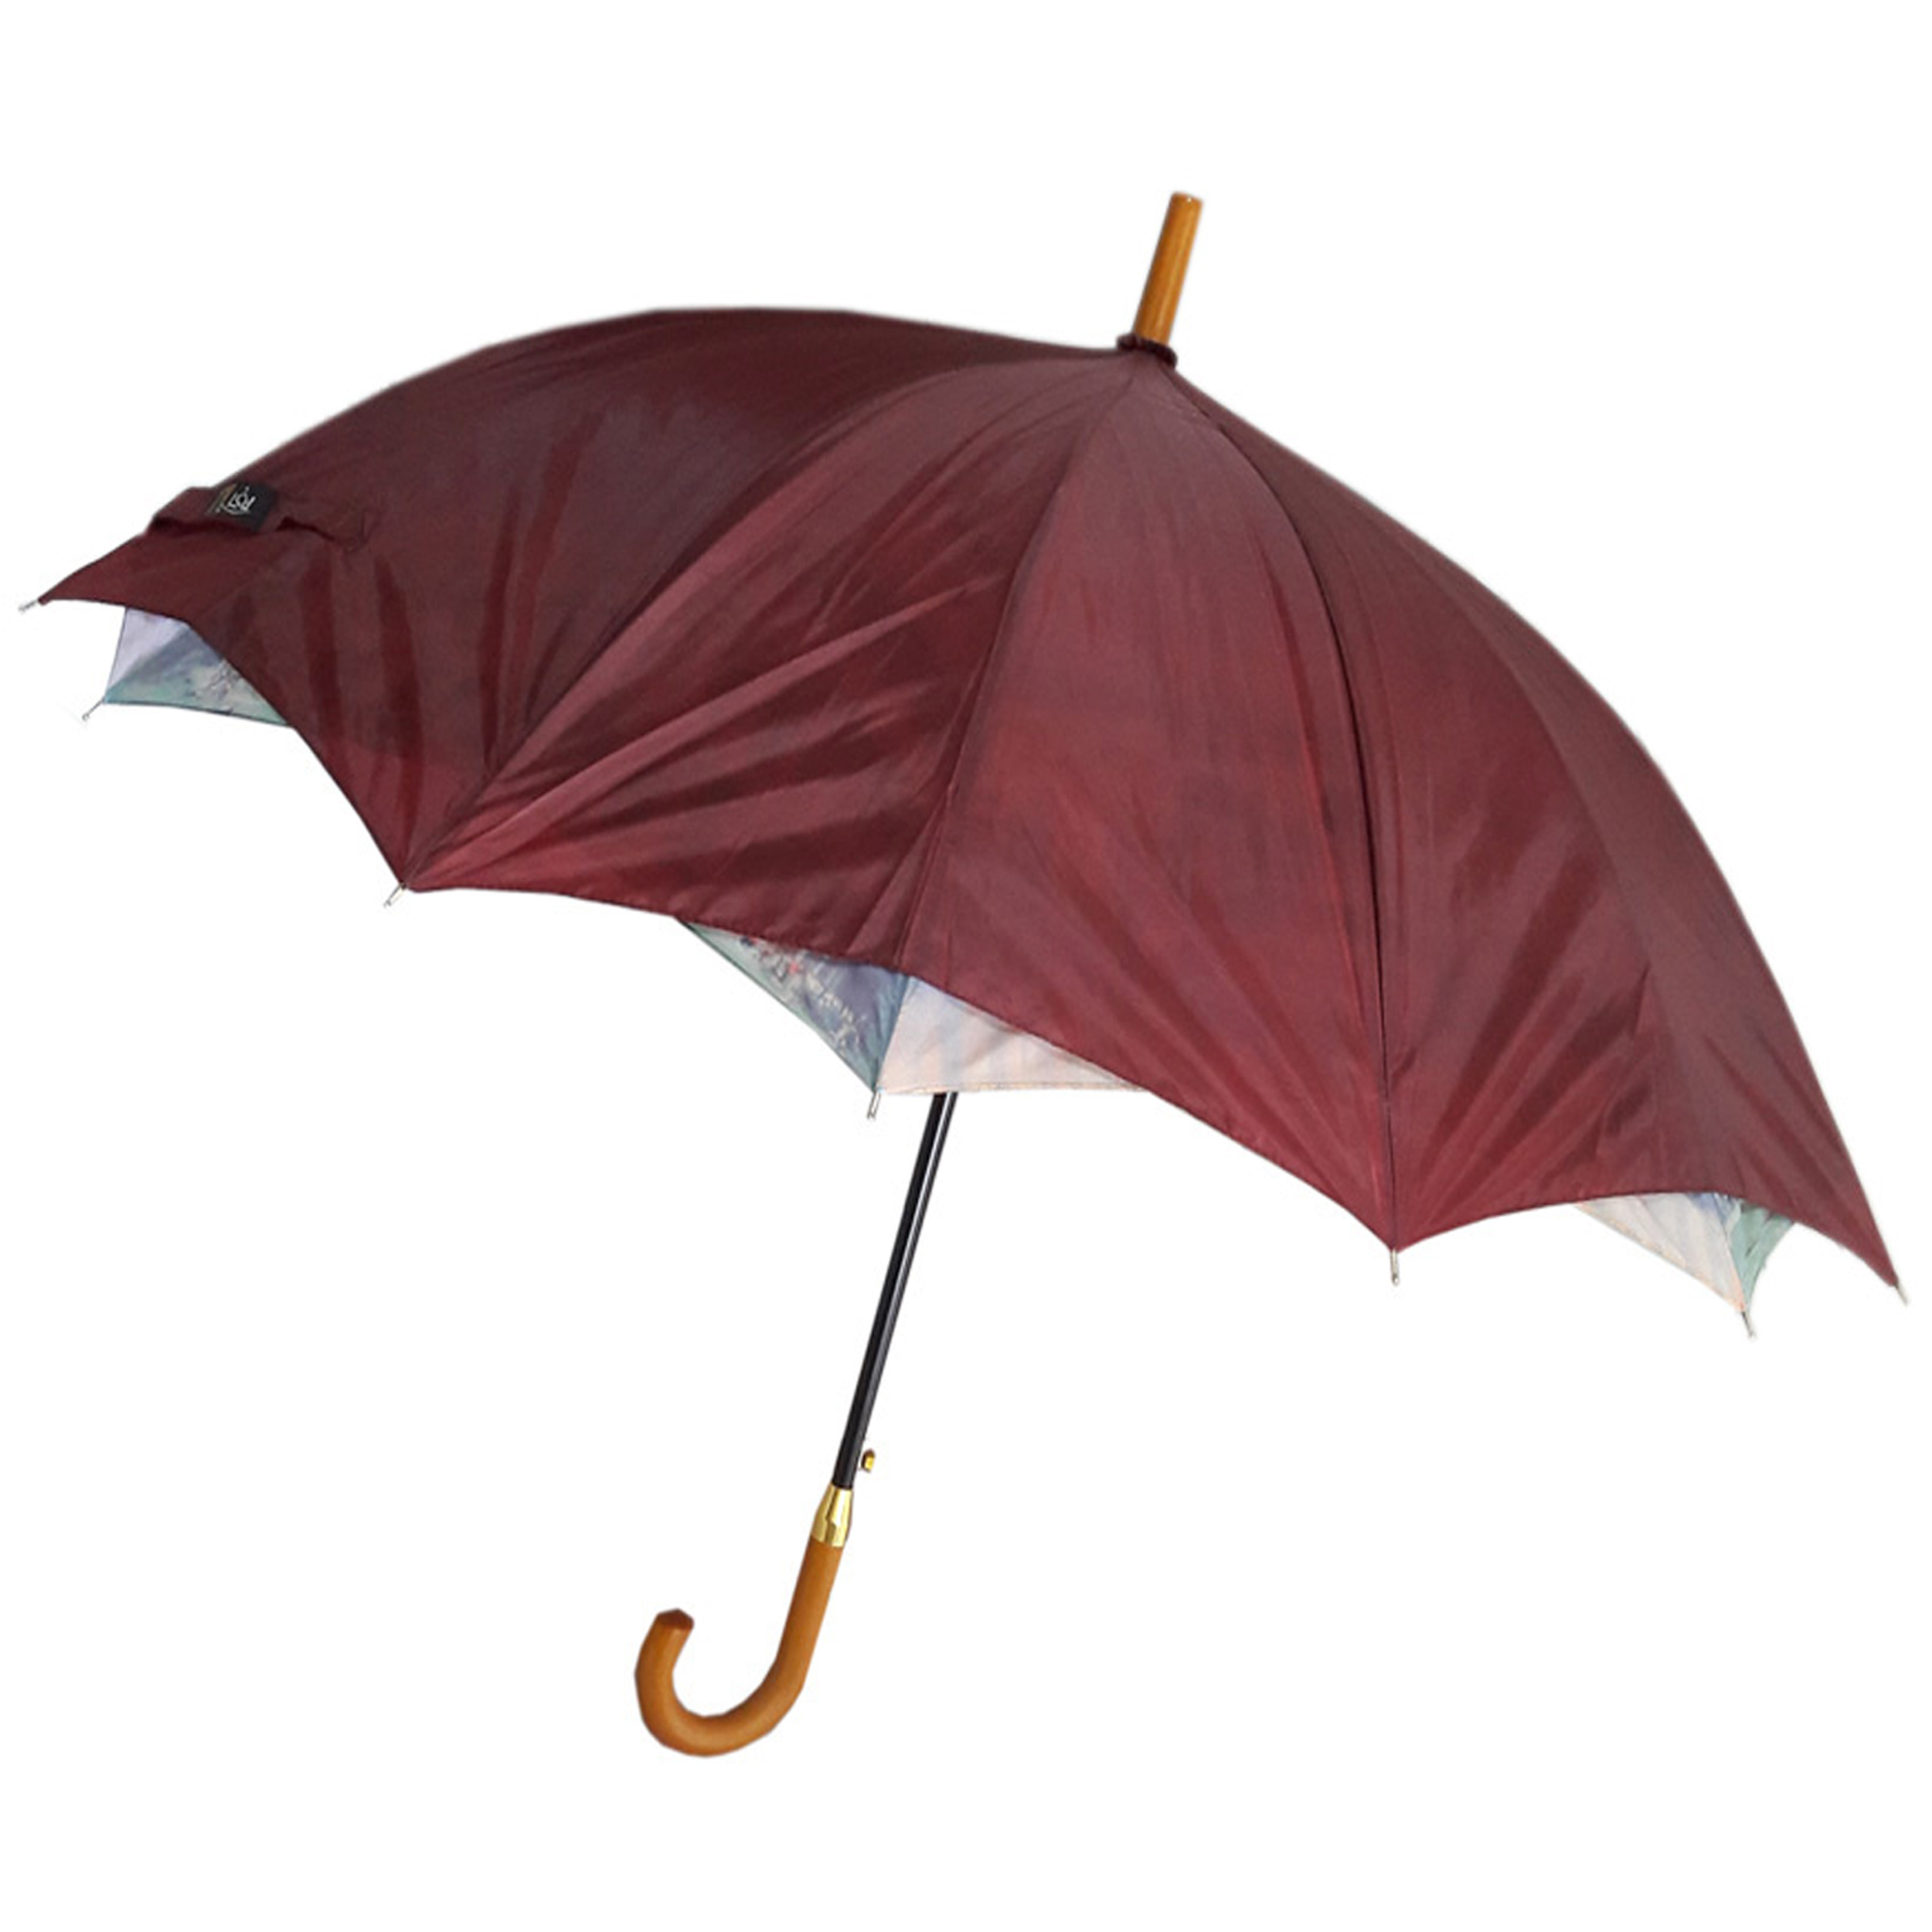 چتر آر اس تی کد GH37